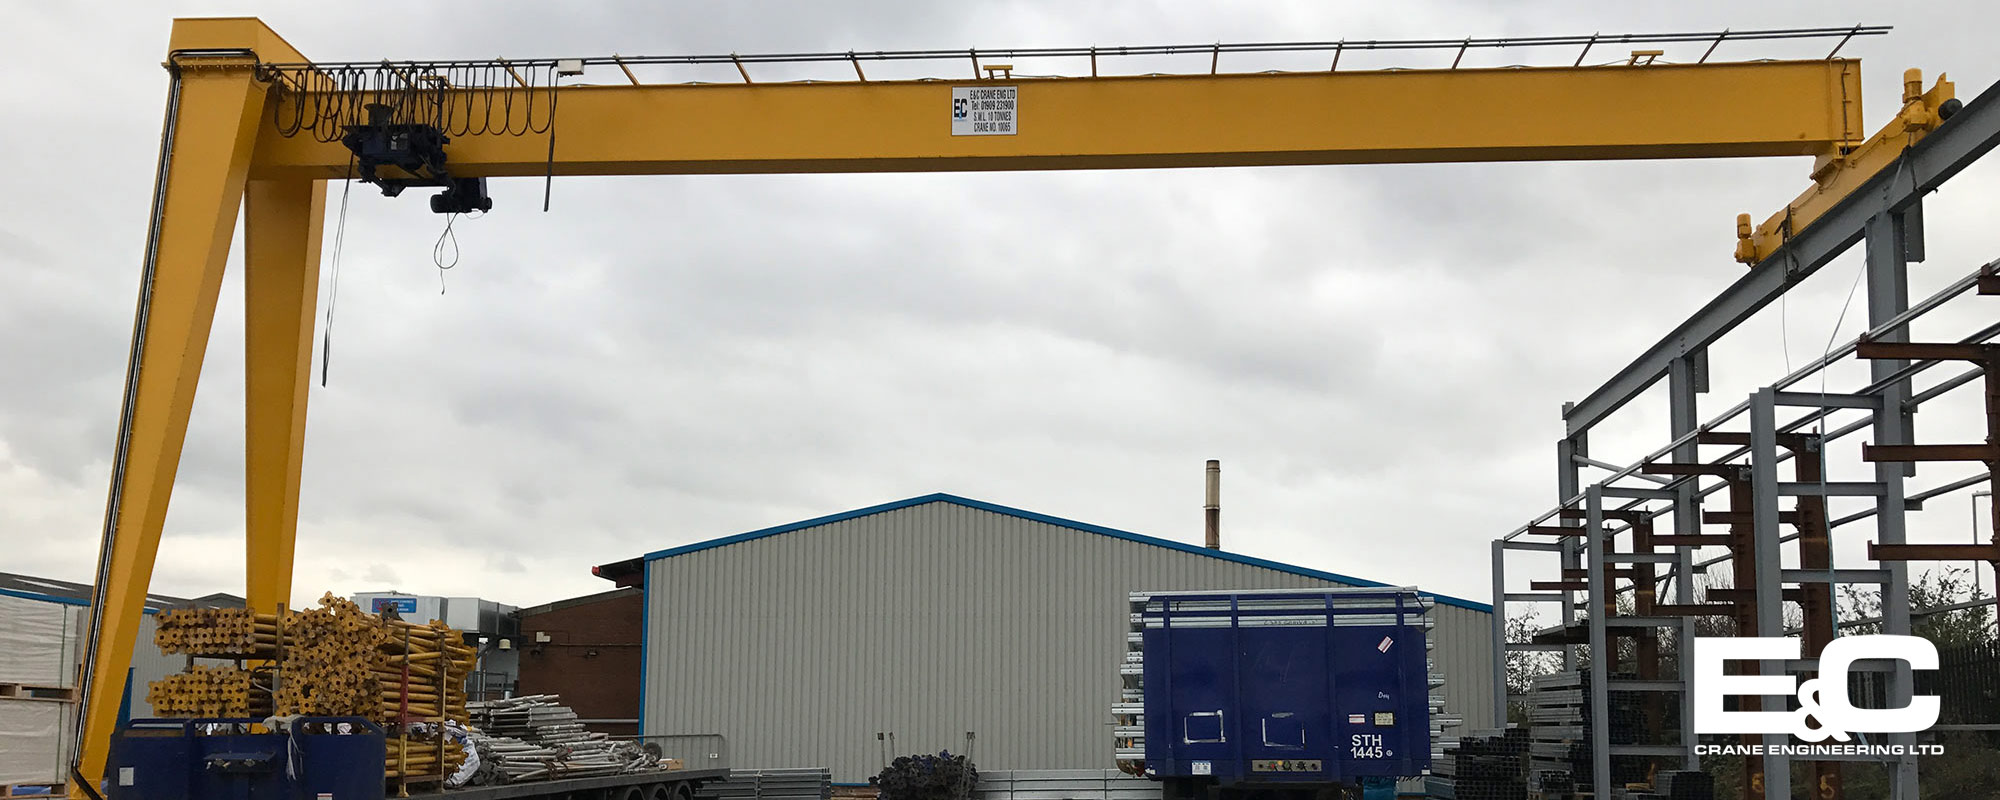 Overhead Crane Lifting Procedure : E c crane engineering ltd new used cranes